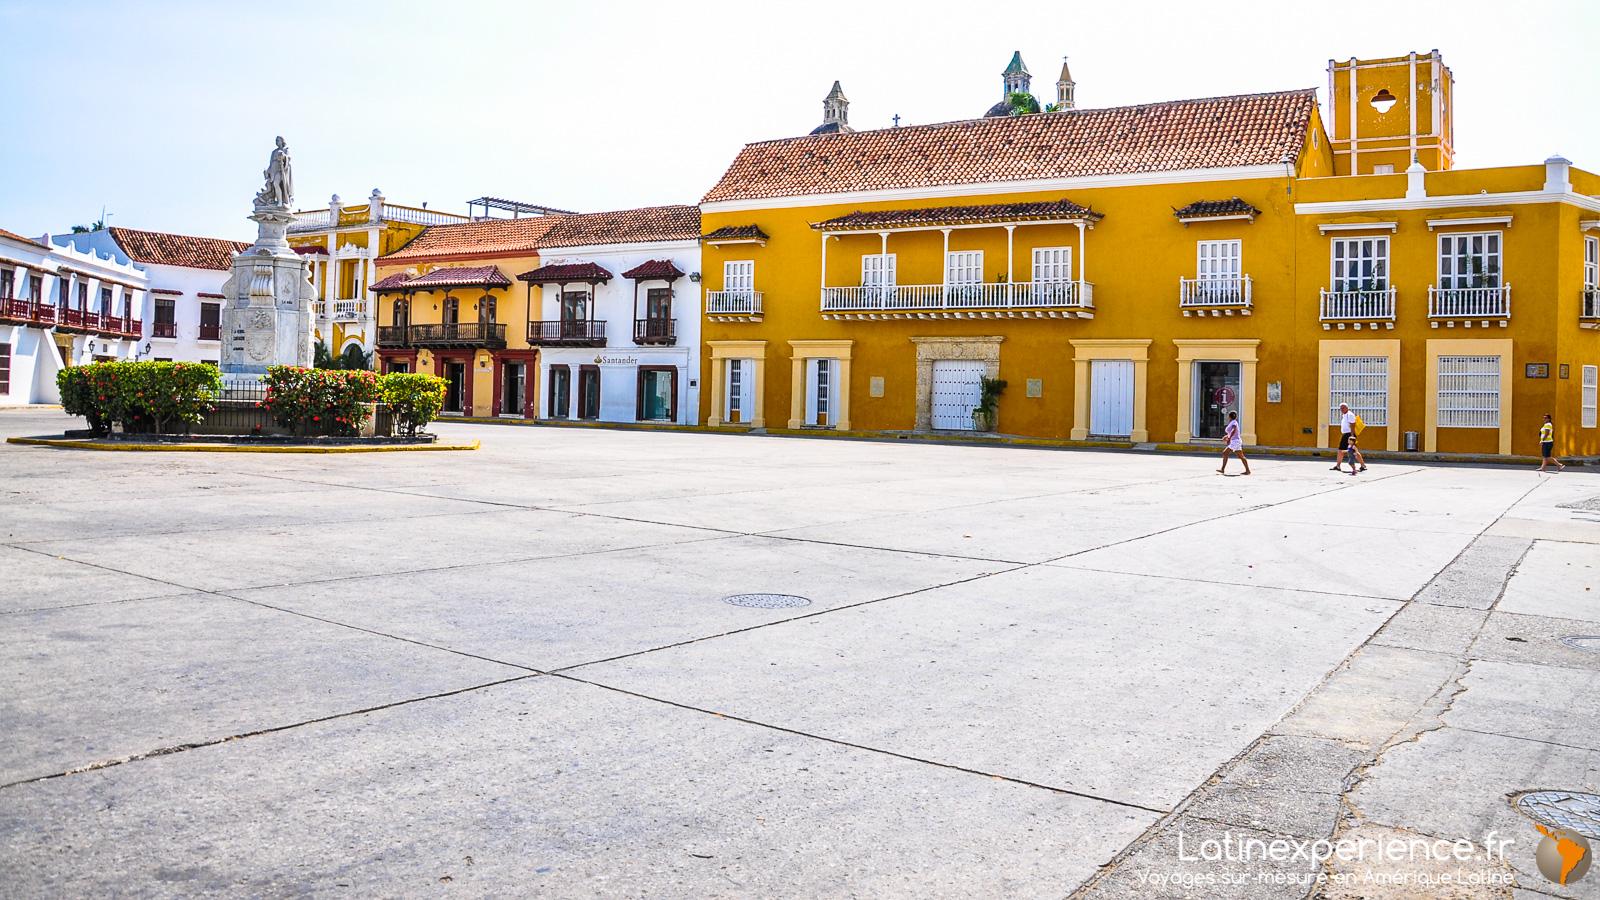 Colombie - Carthagene - Latinexperience voyages